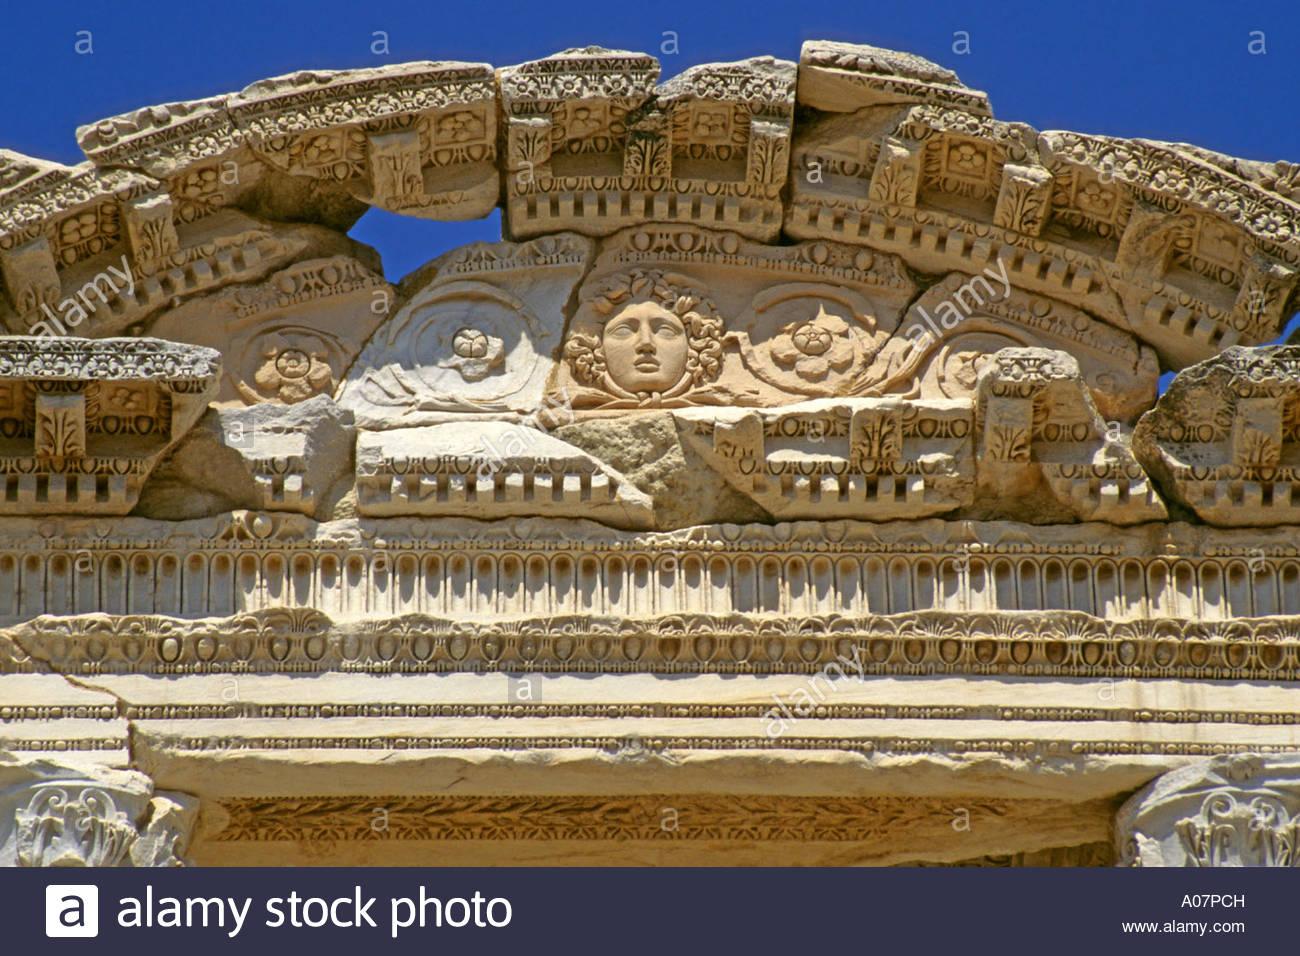 Pediment, Celsus Library, Ephesus - Stock Image